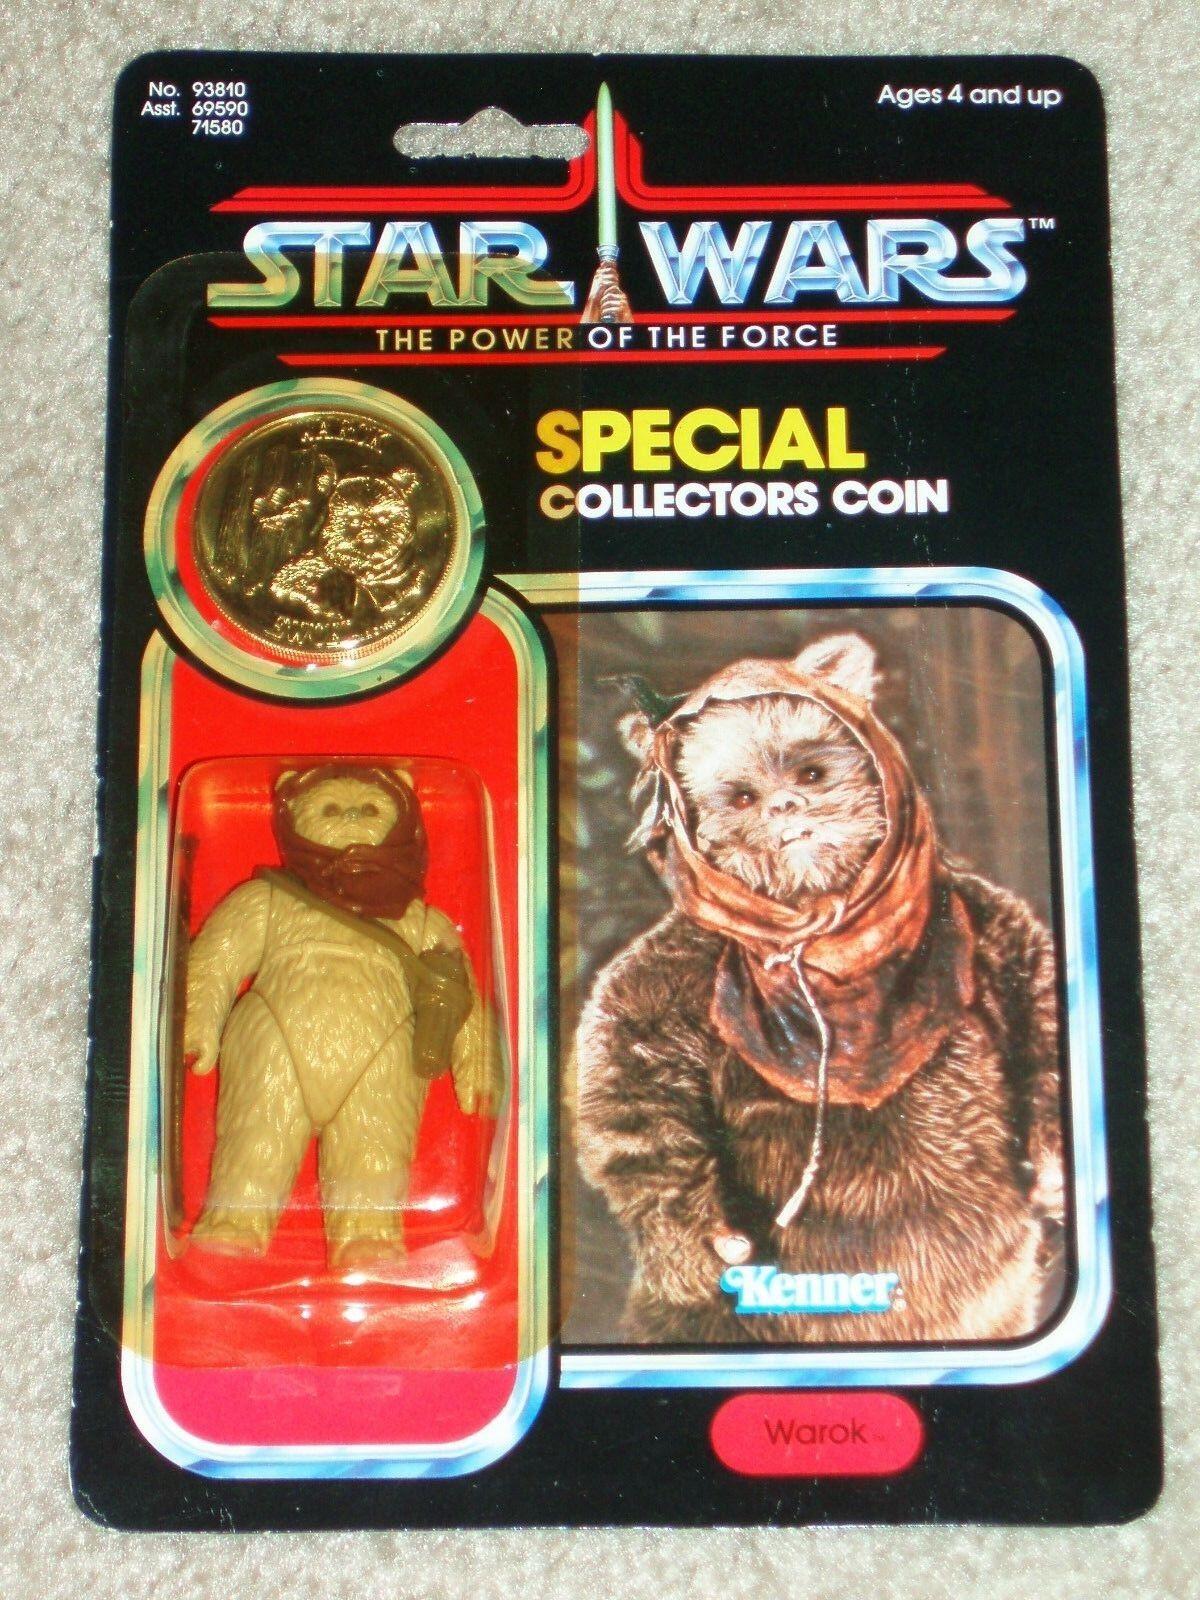 Retro Star Wars 1985 Kenner Warok Ewok Potf 92 tarjeta trasera Moc AFA él